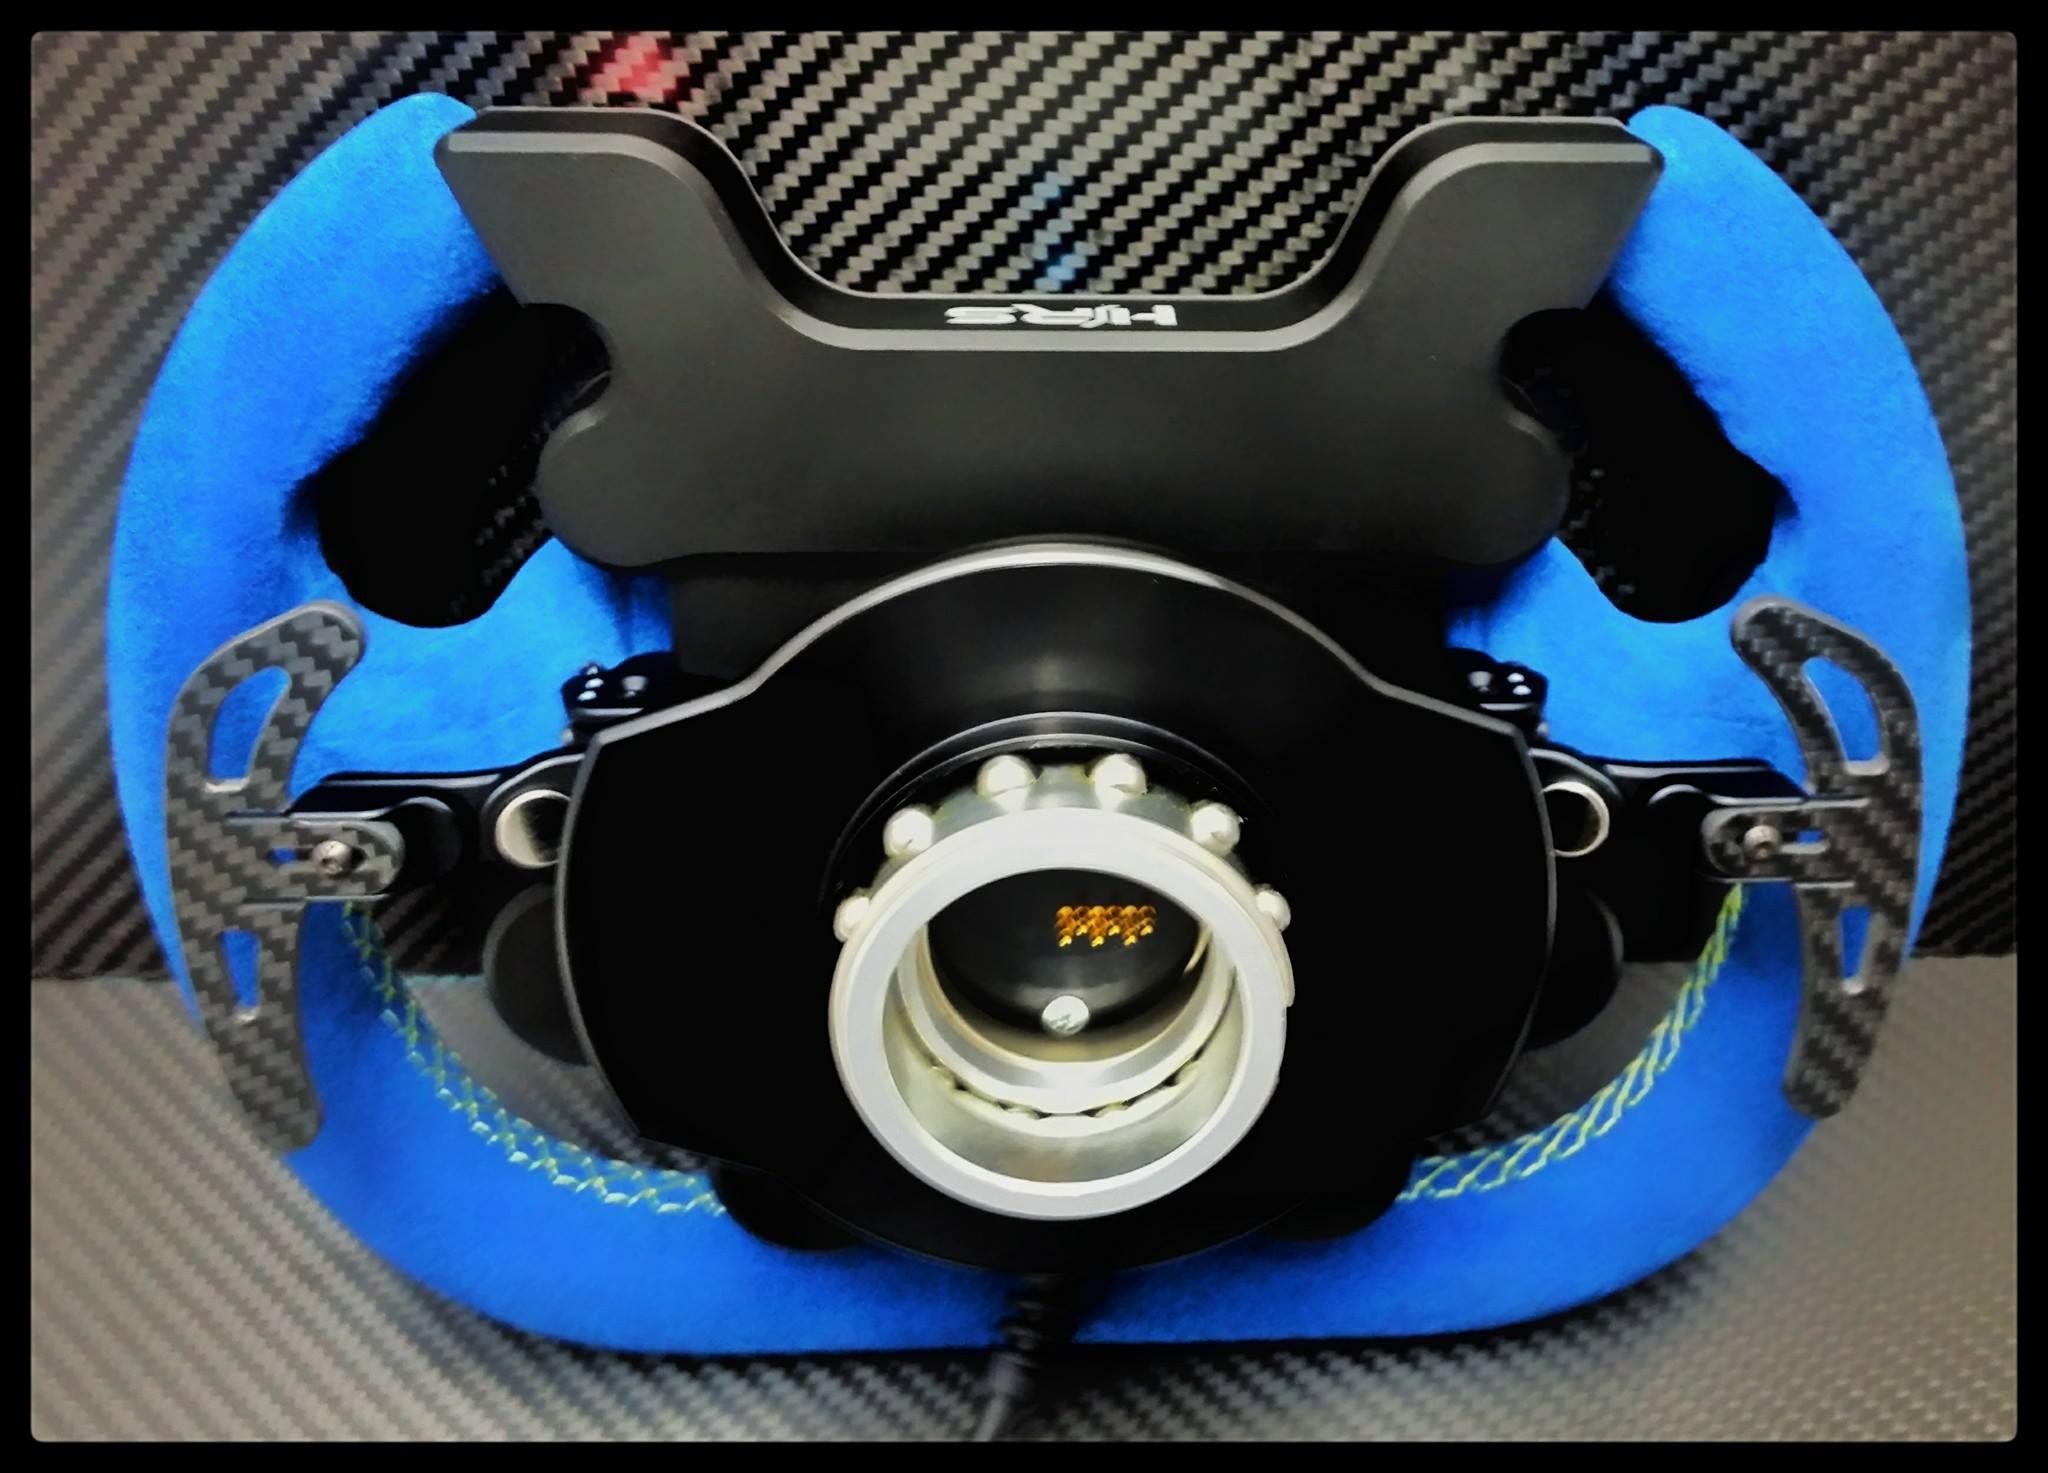 hybrid racing simulation hrs 280 en vente objectif racing le hub des simracers sur pc ps4. Black Bedroom Furniture Sets. Home Design Ideas